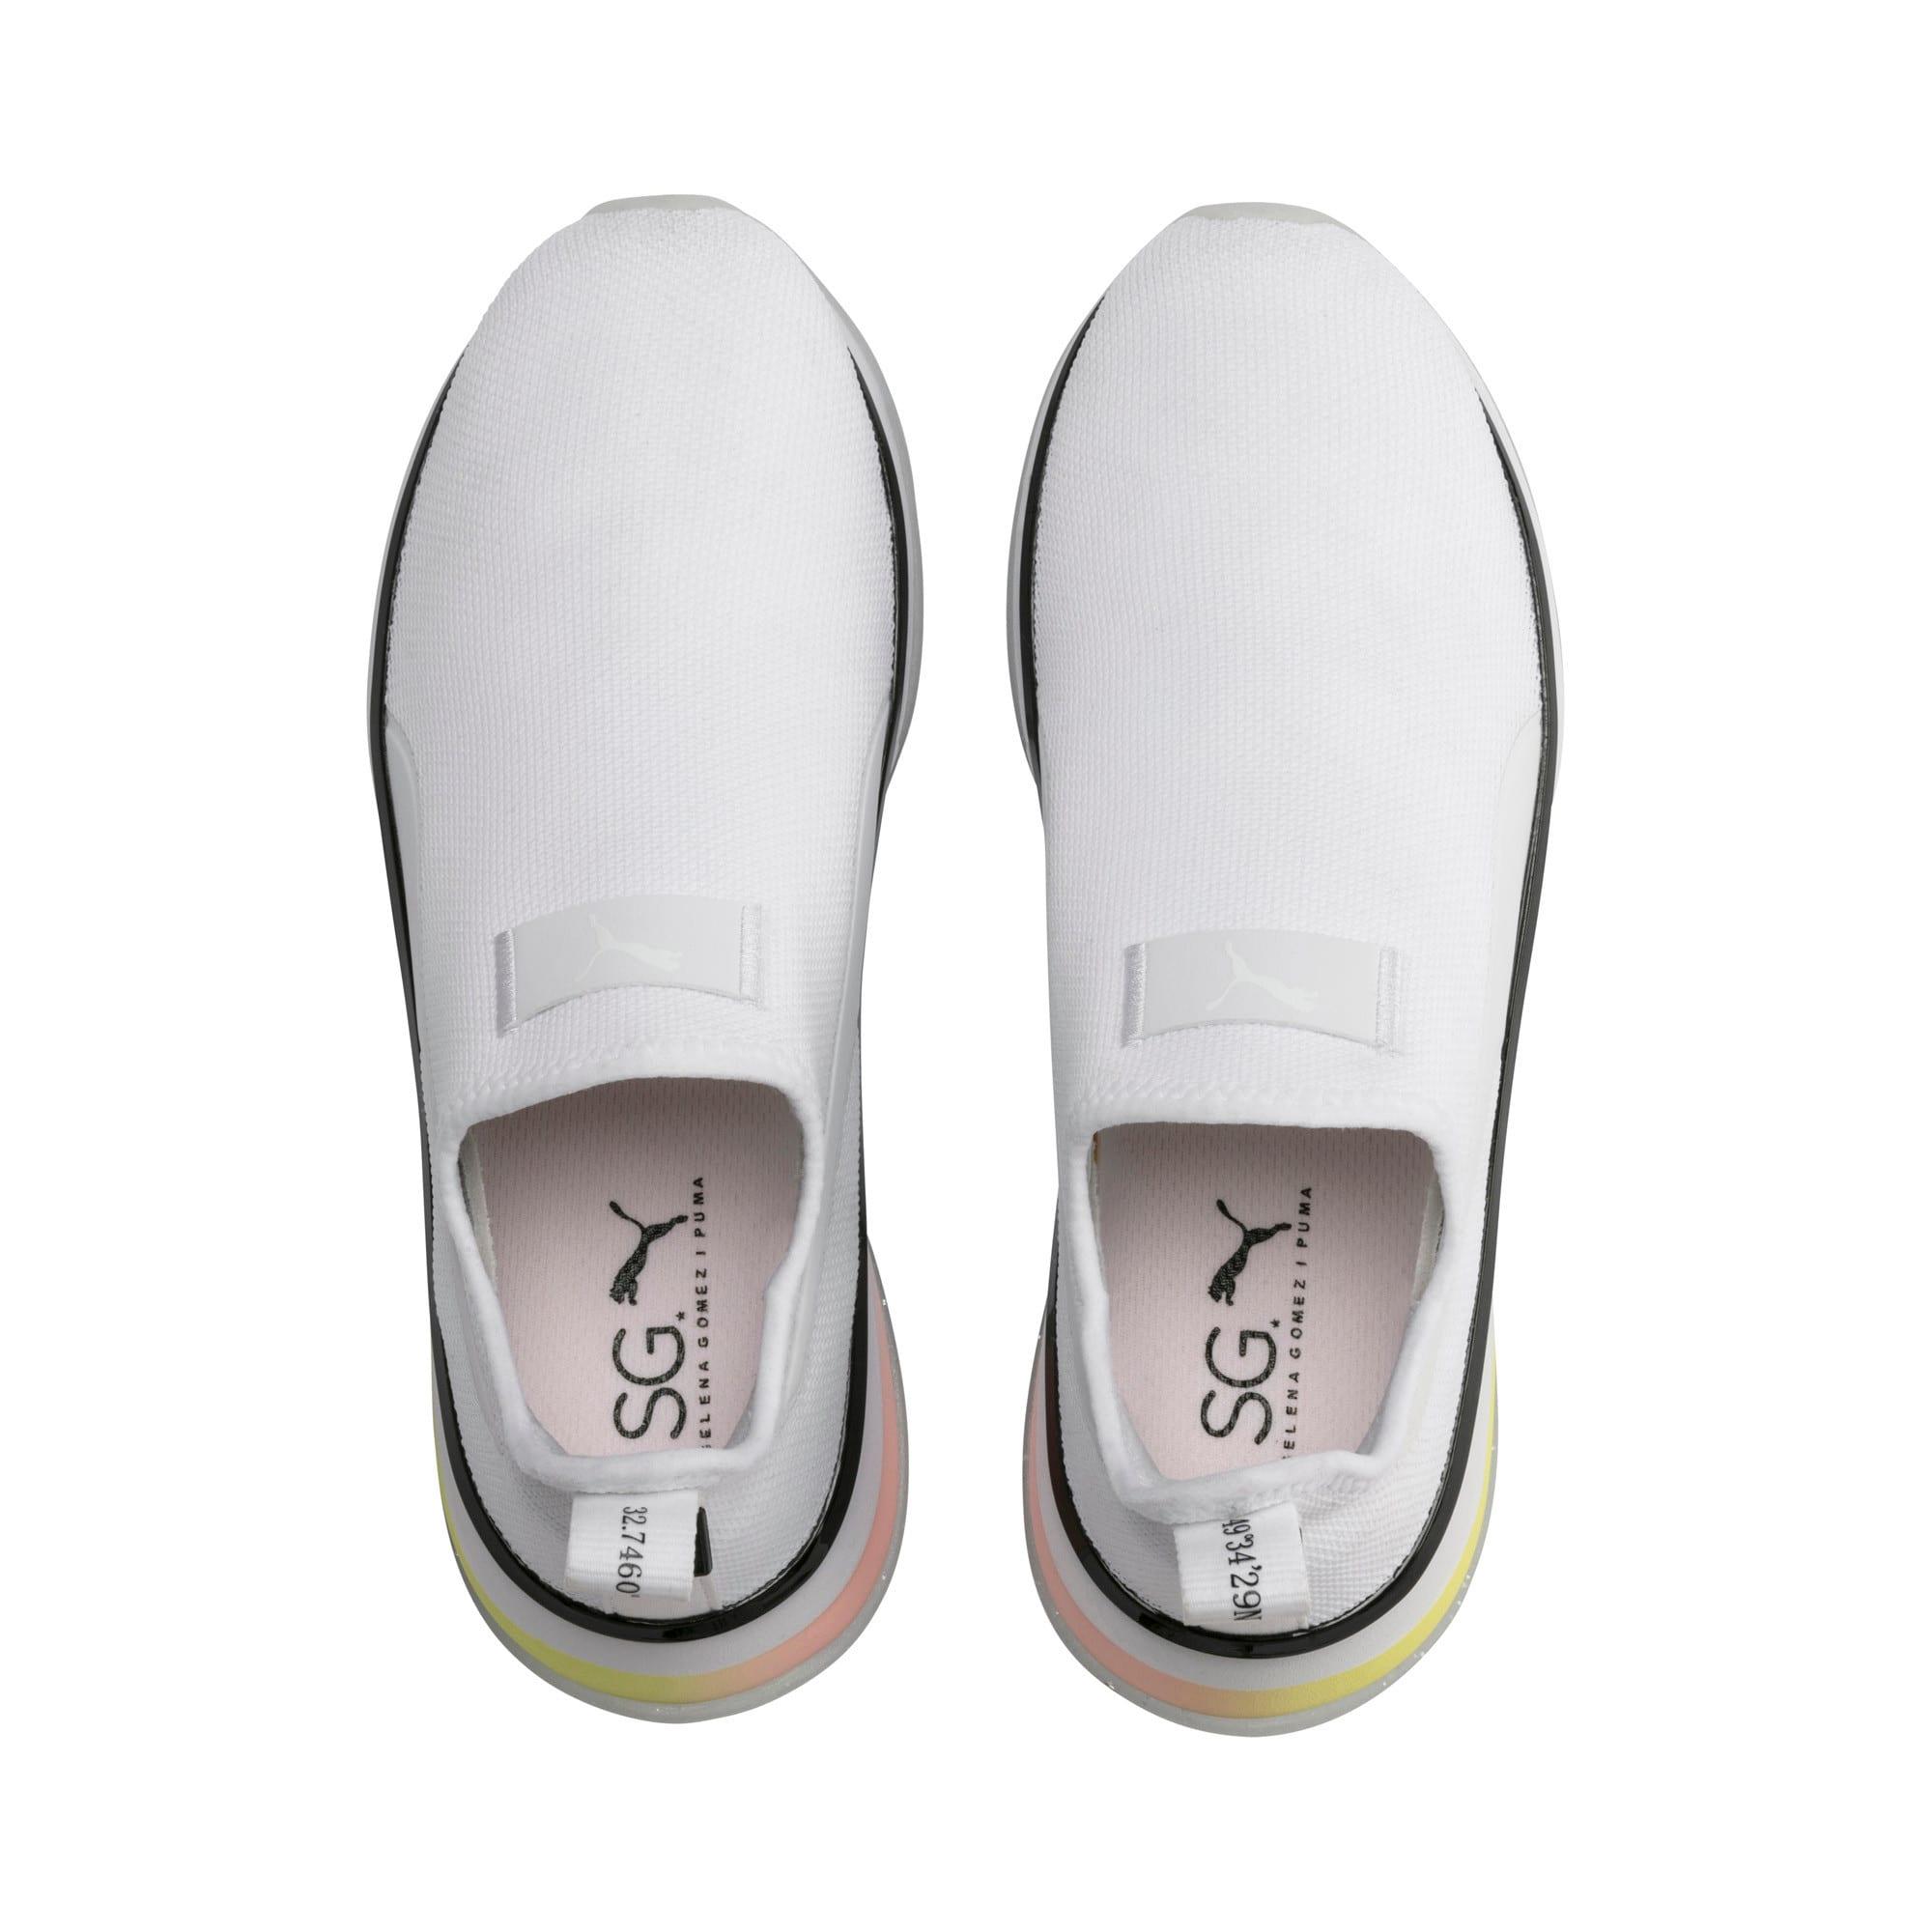 Thumbnail 7 of PUMA x SELENA GOMEZ Slip-On Women's Training Shoes, Puma White-Puma Black, medium